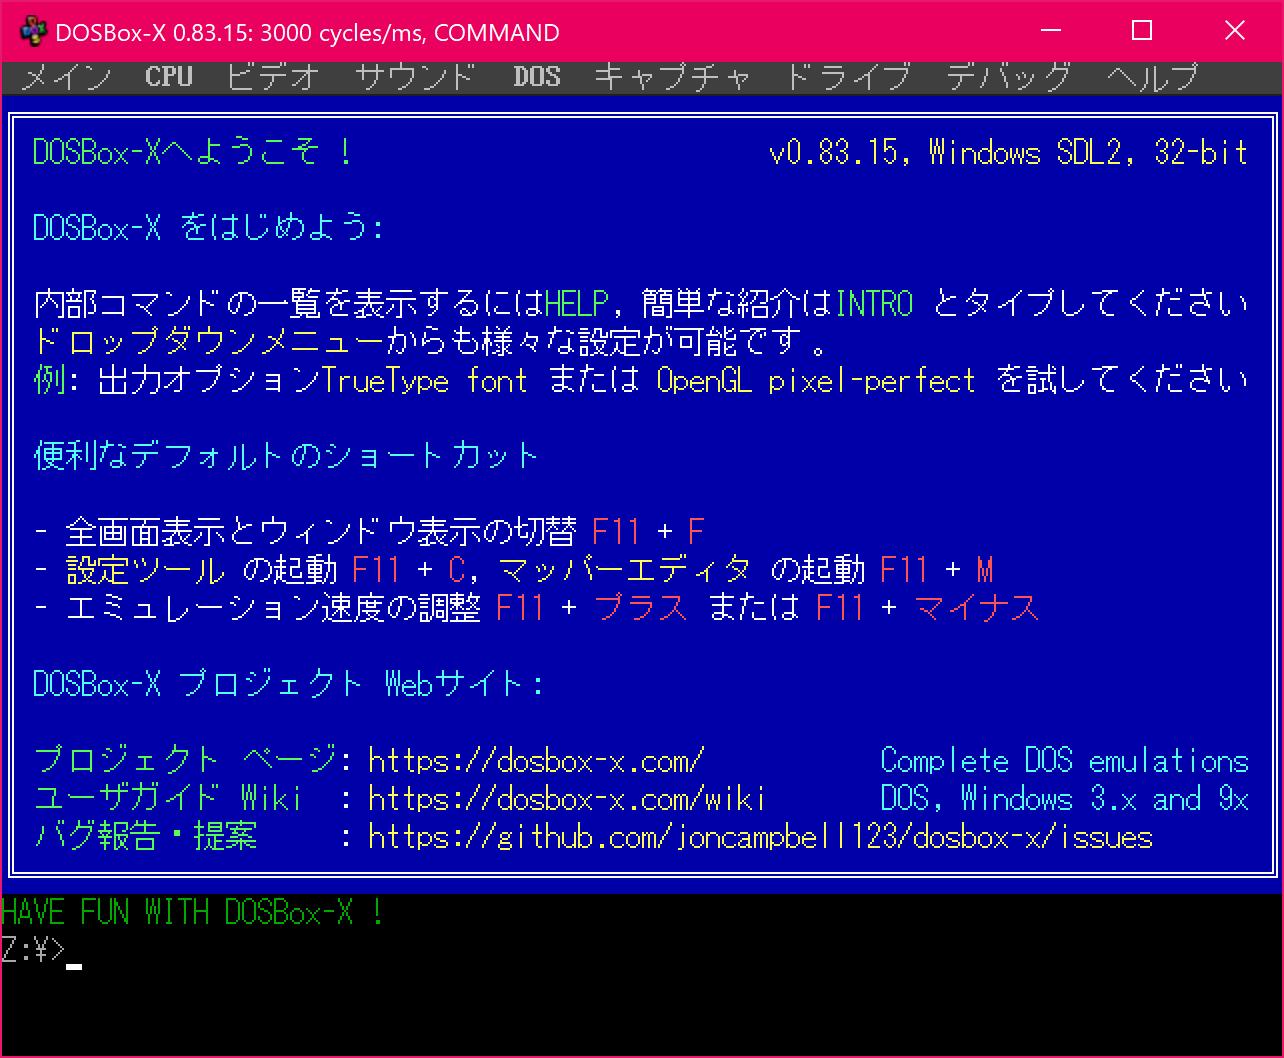 Japanese DOS/V emulation